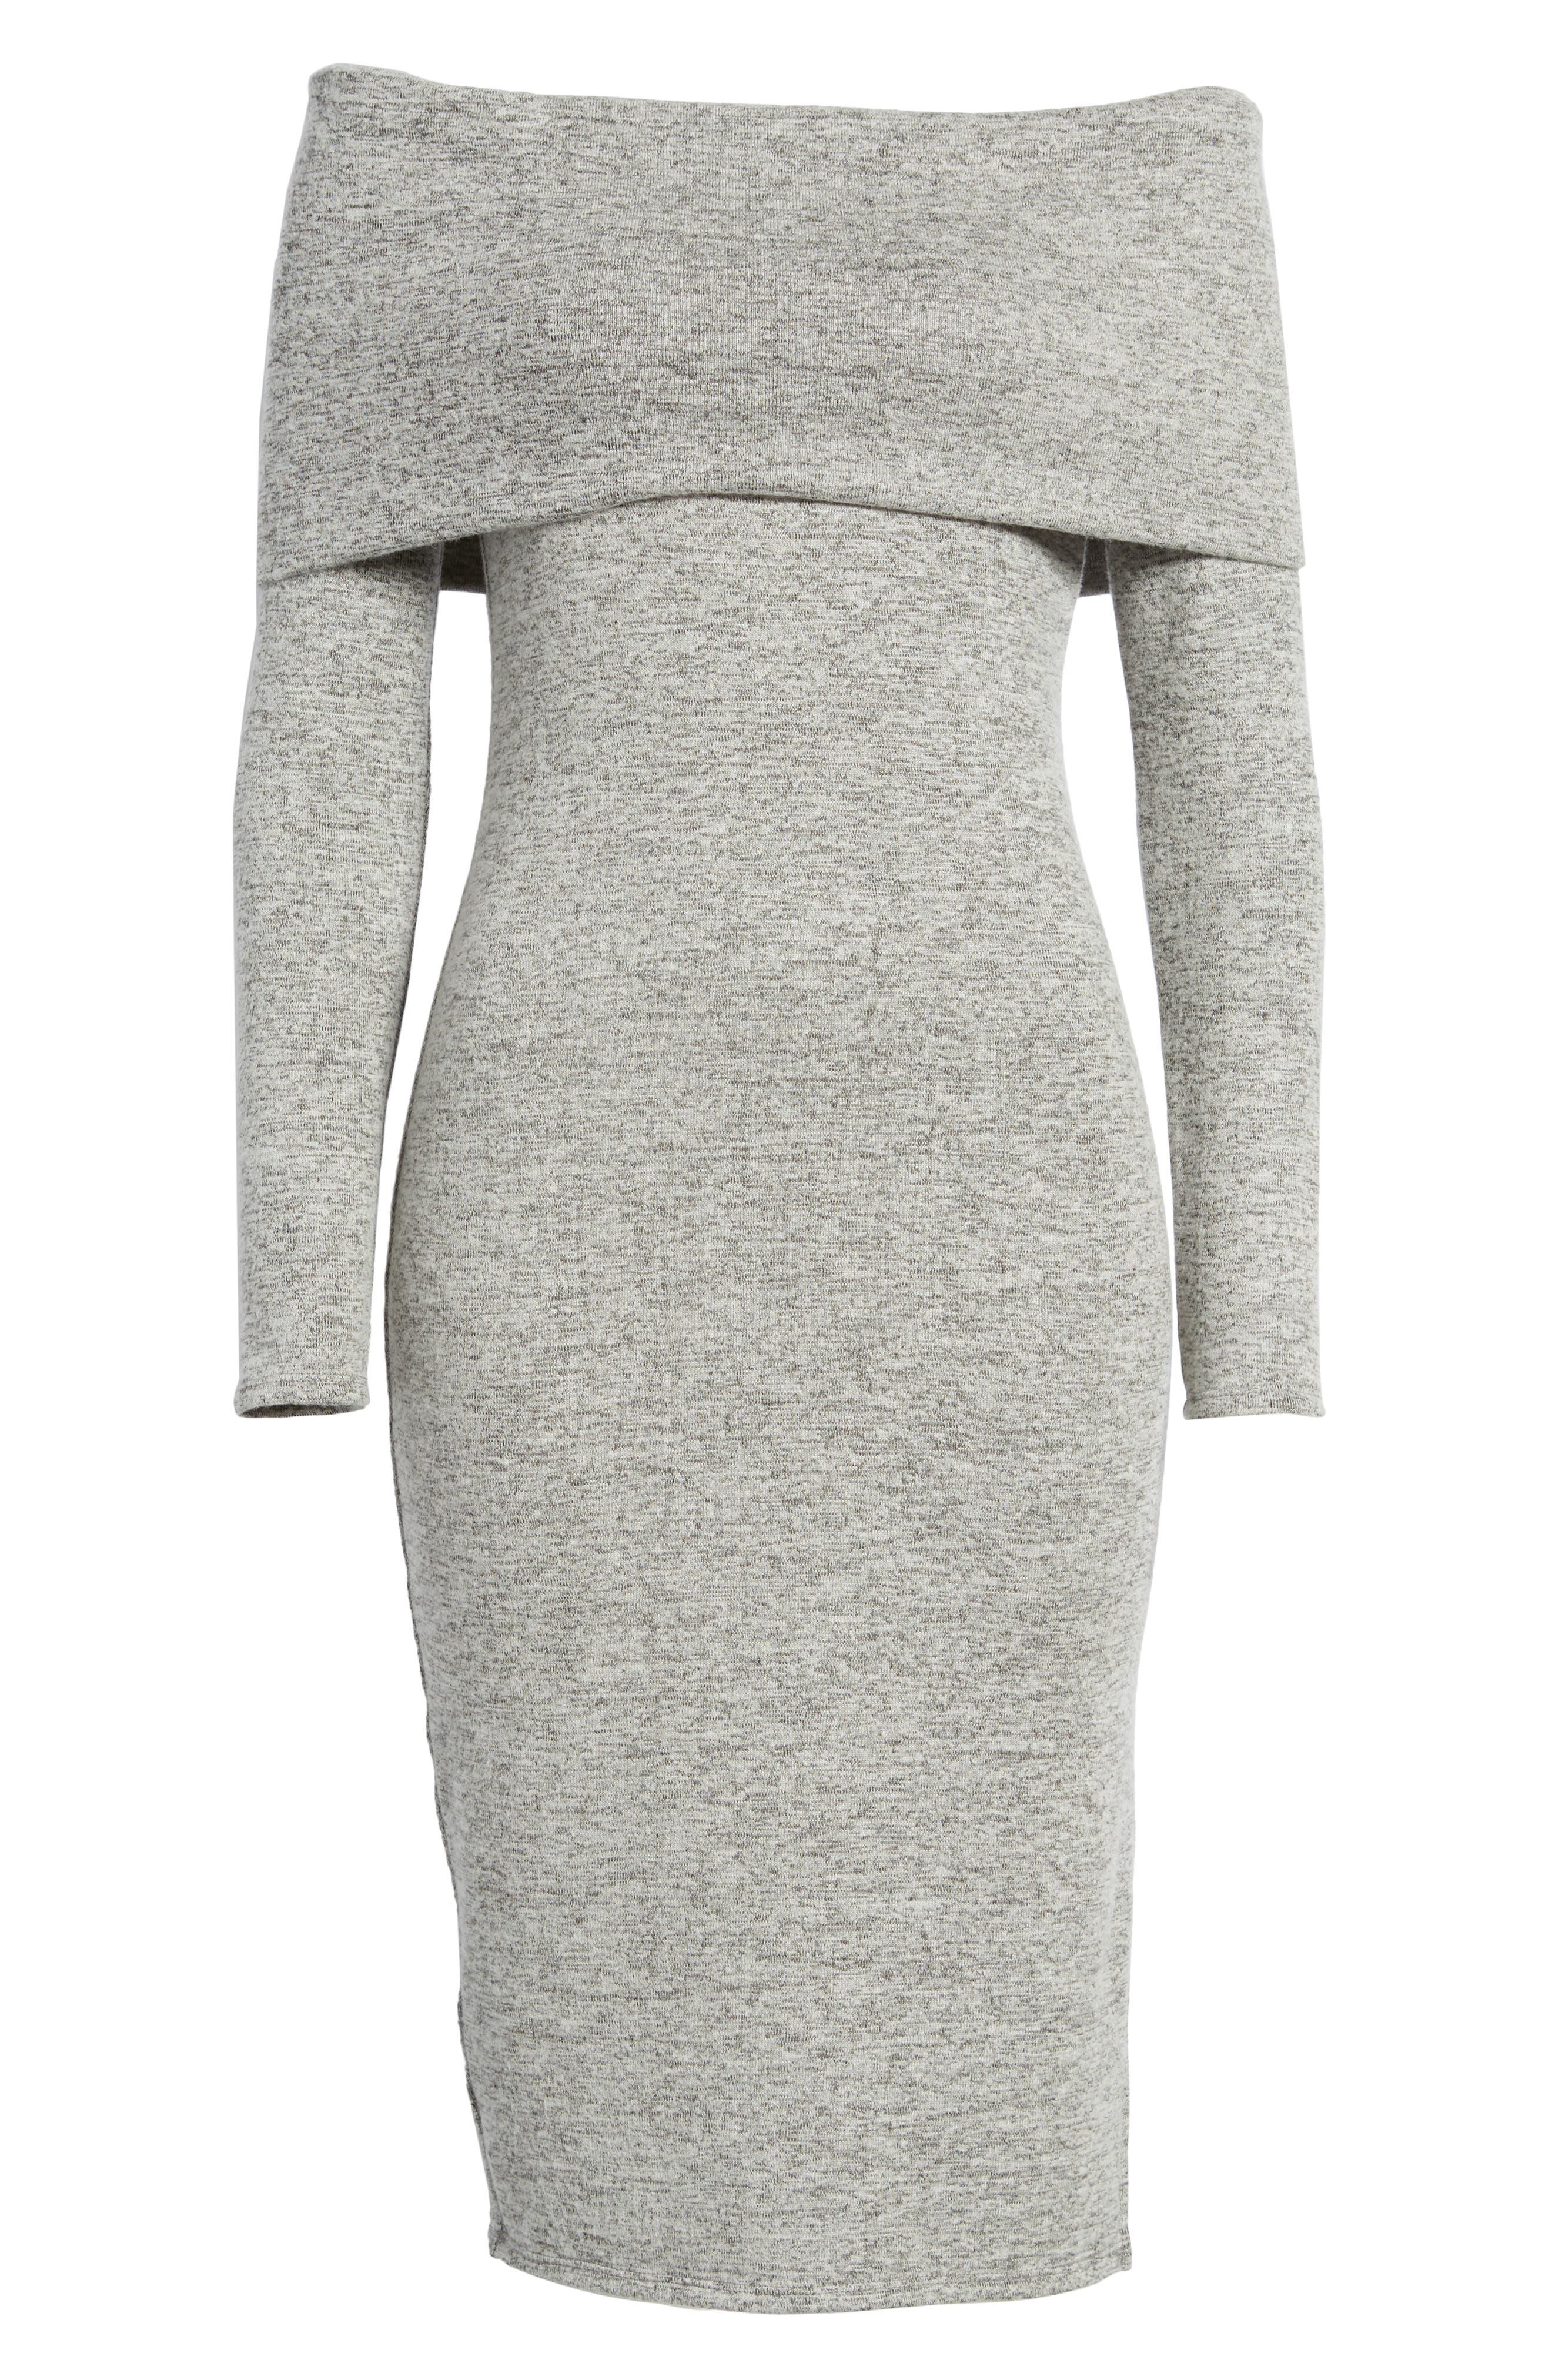 Off the Shoulder Sweater Dress,                             Alternate thumbnail 6, color,                             H GREY